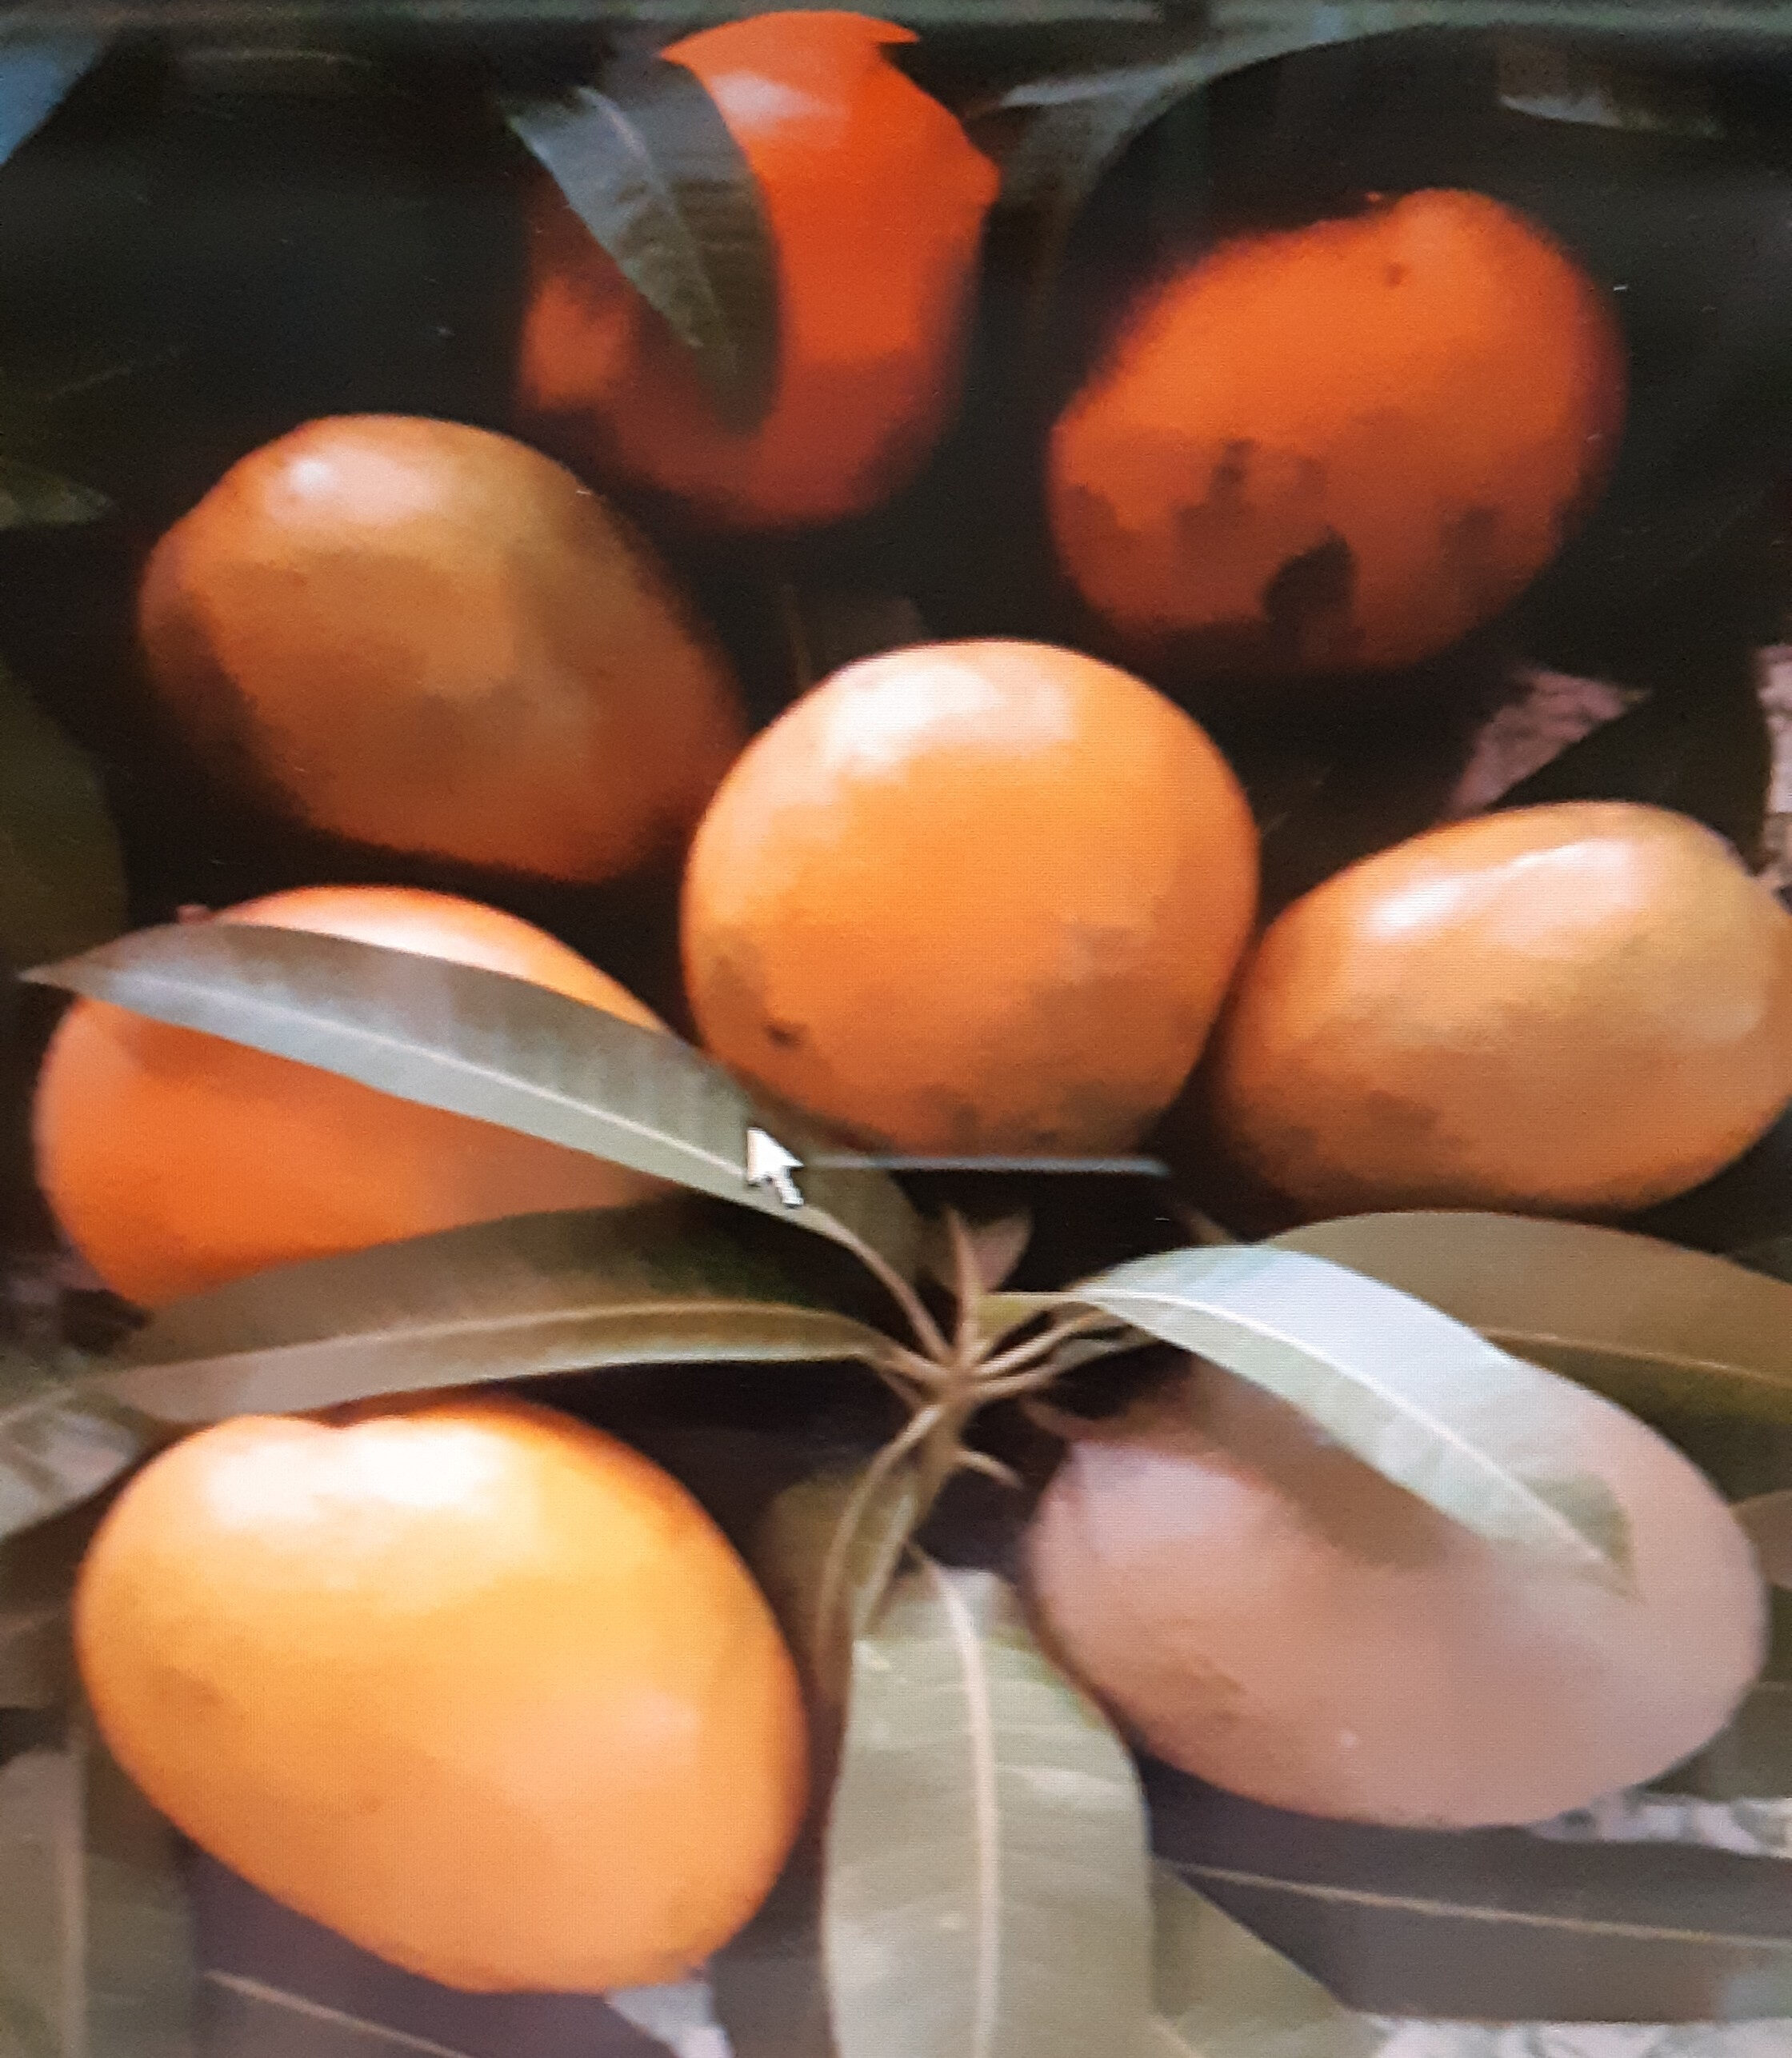 confiture de mangue du Burkina Faso - Product